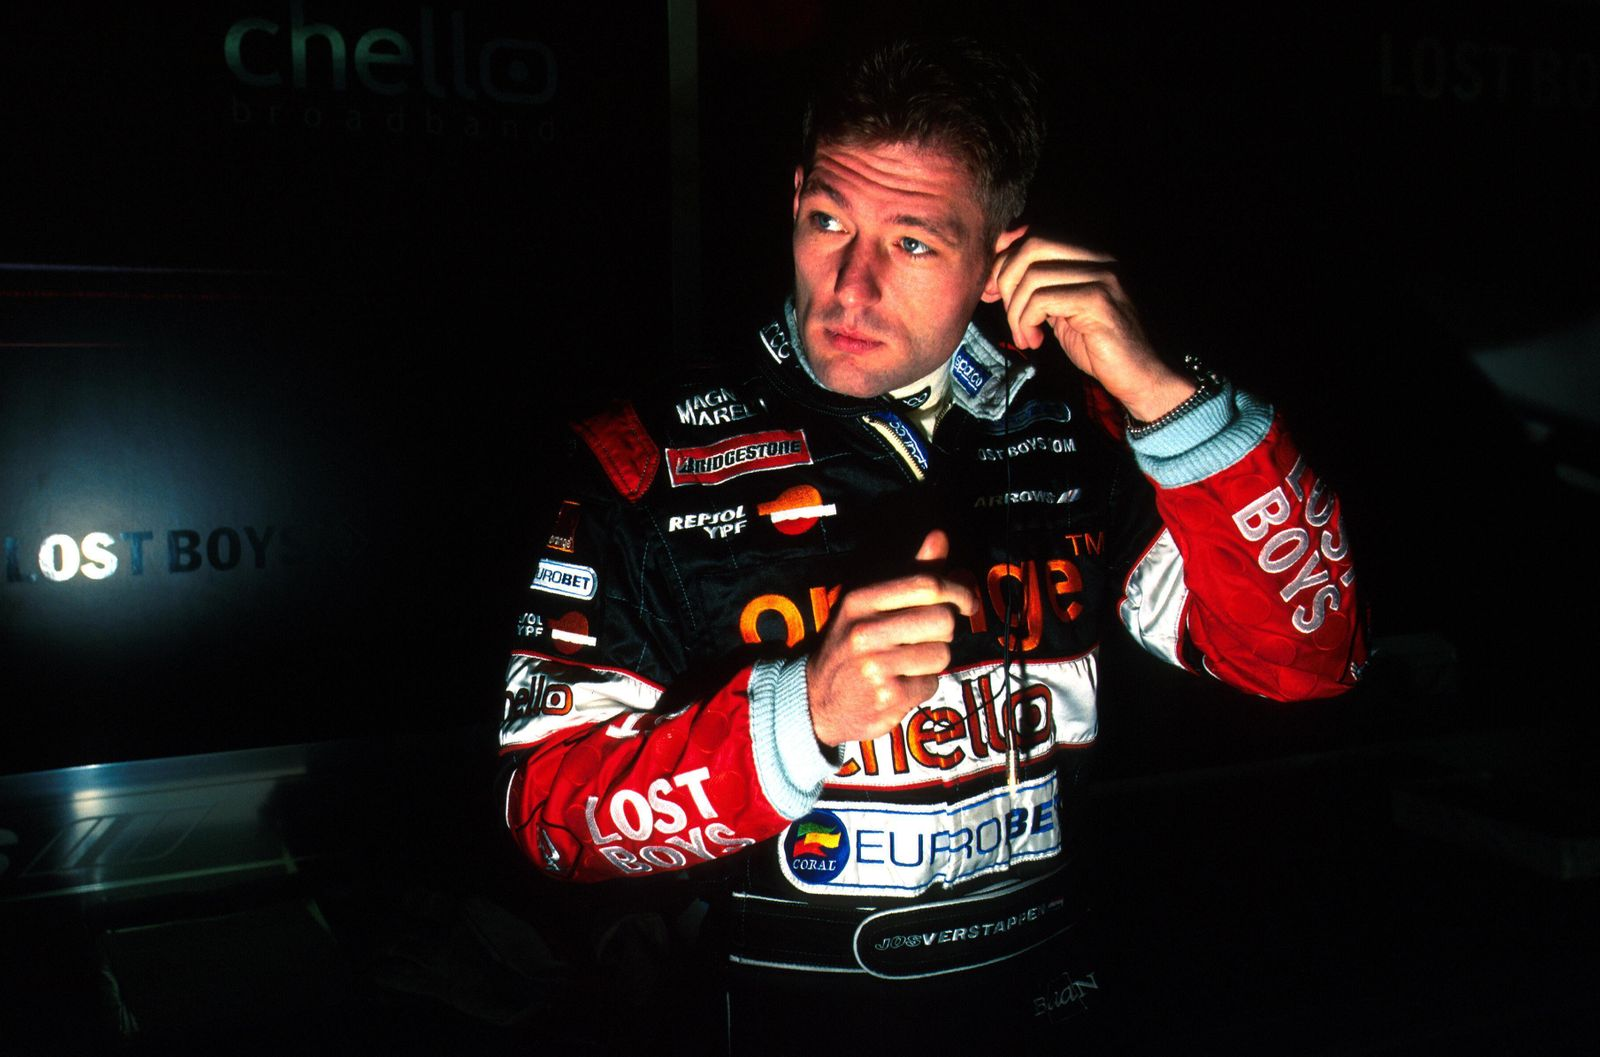 Jos Verstappen (NED) Arrows, 14th place San Marino GP, Imola, 9 April 2000 PUBLICATIONxINxGERxSUIxAUTxHUNxONLY 00sm058